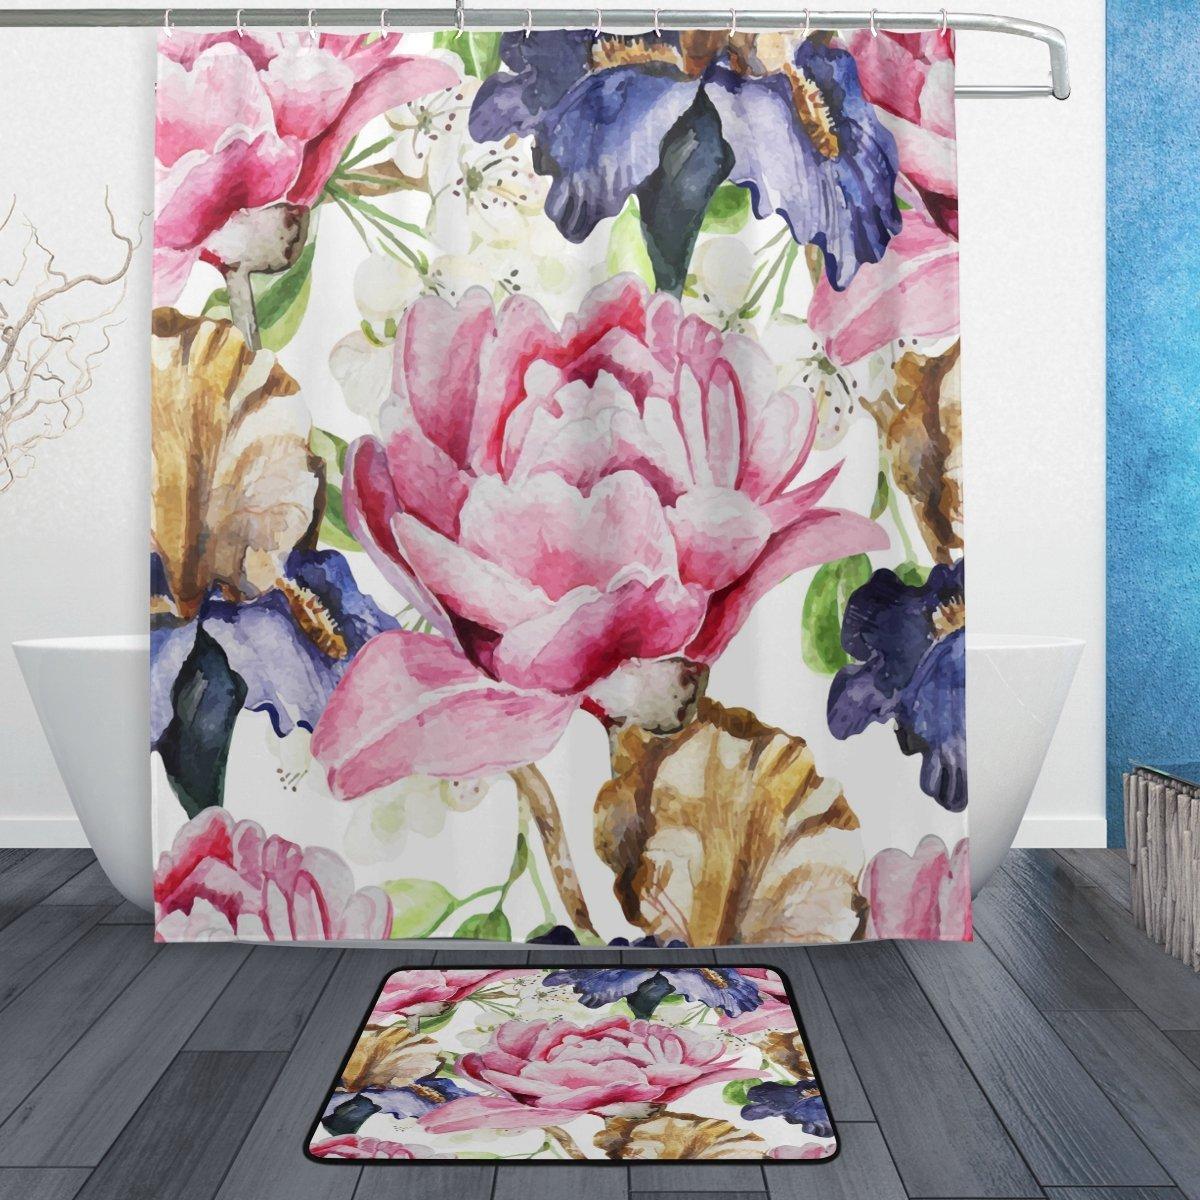 Vintage Watercolor Pink Flower Waterproof Polyester Fabric Shower Curtain with Hooks Doormat Bath Floor Mat Bathroom Home Decor